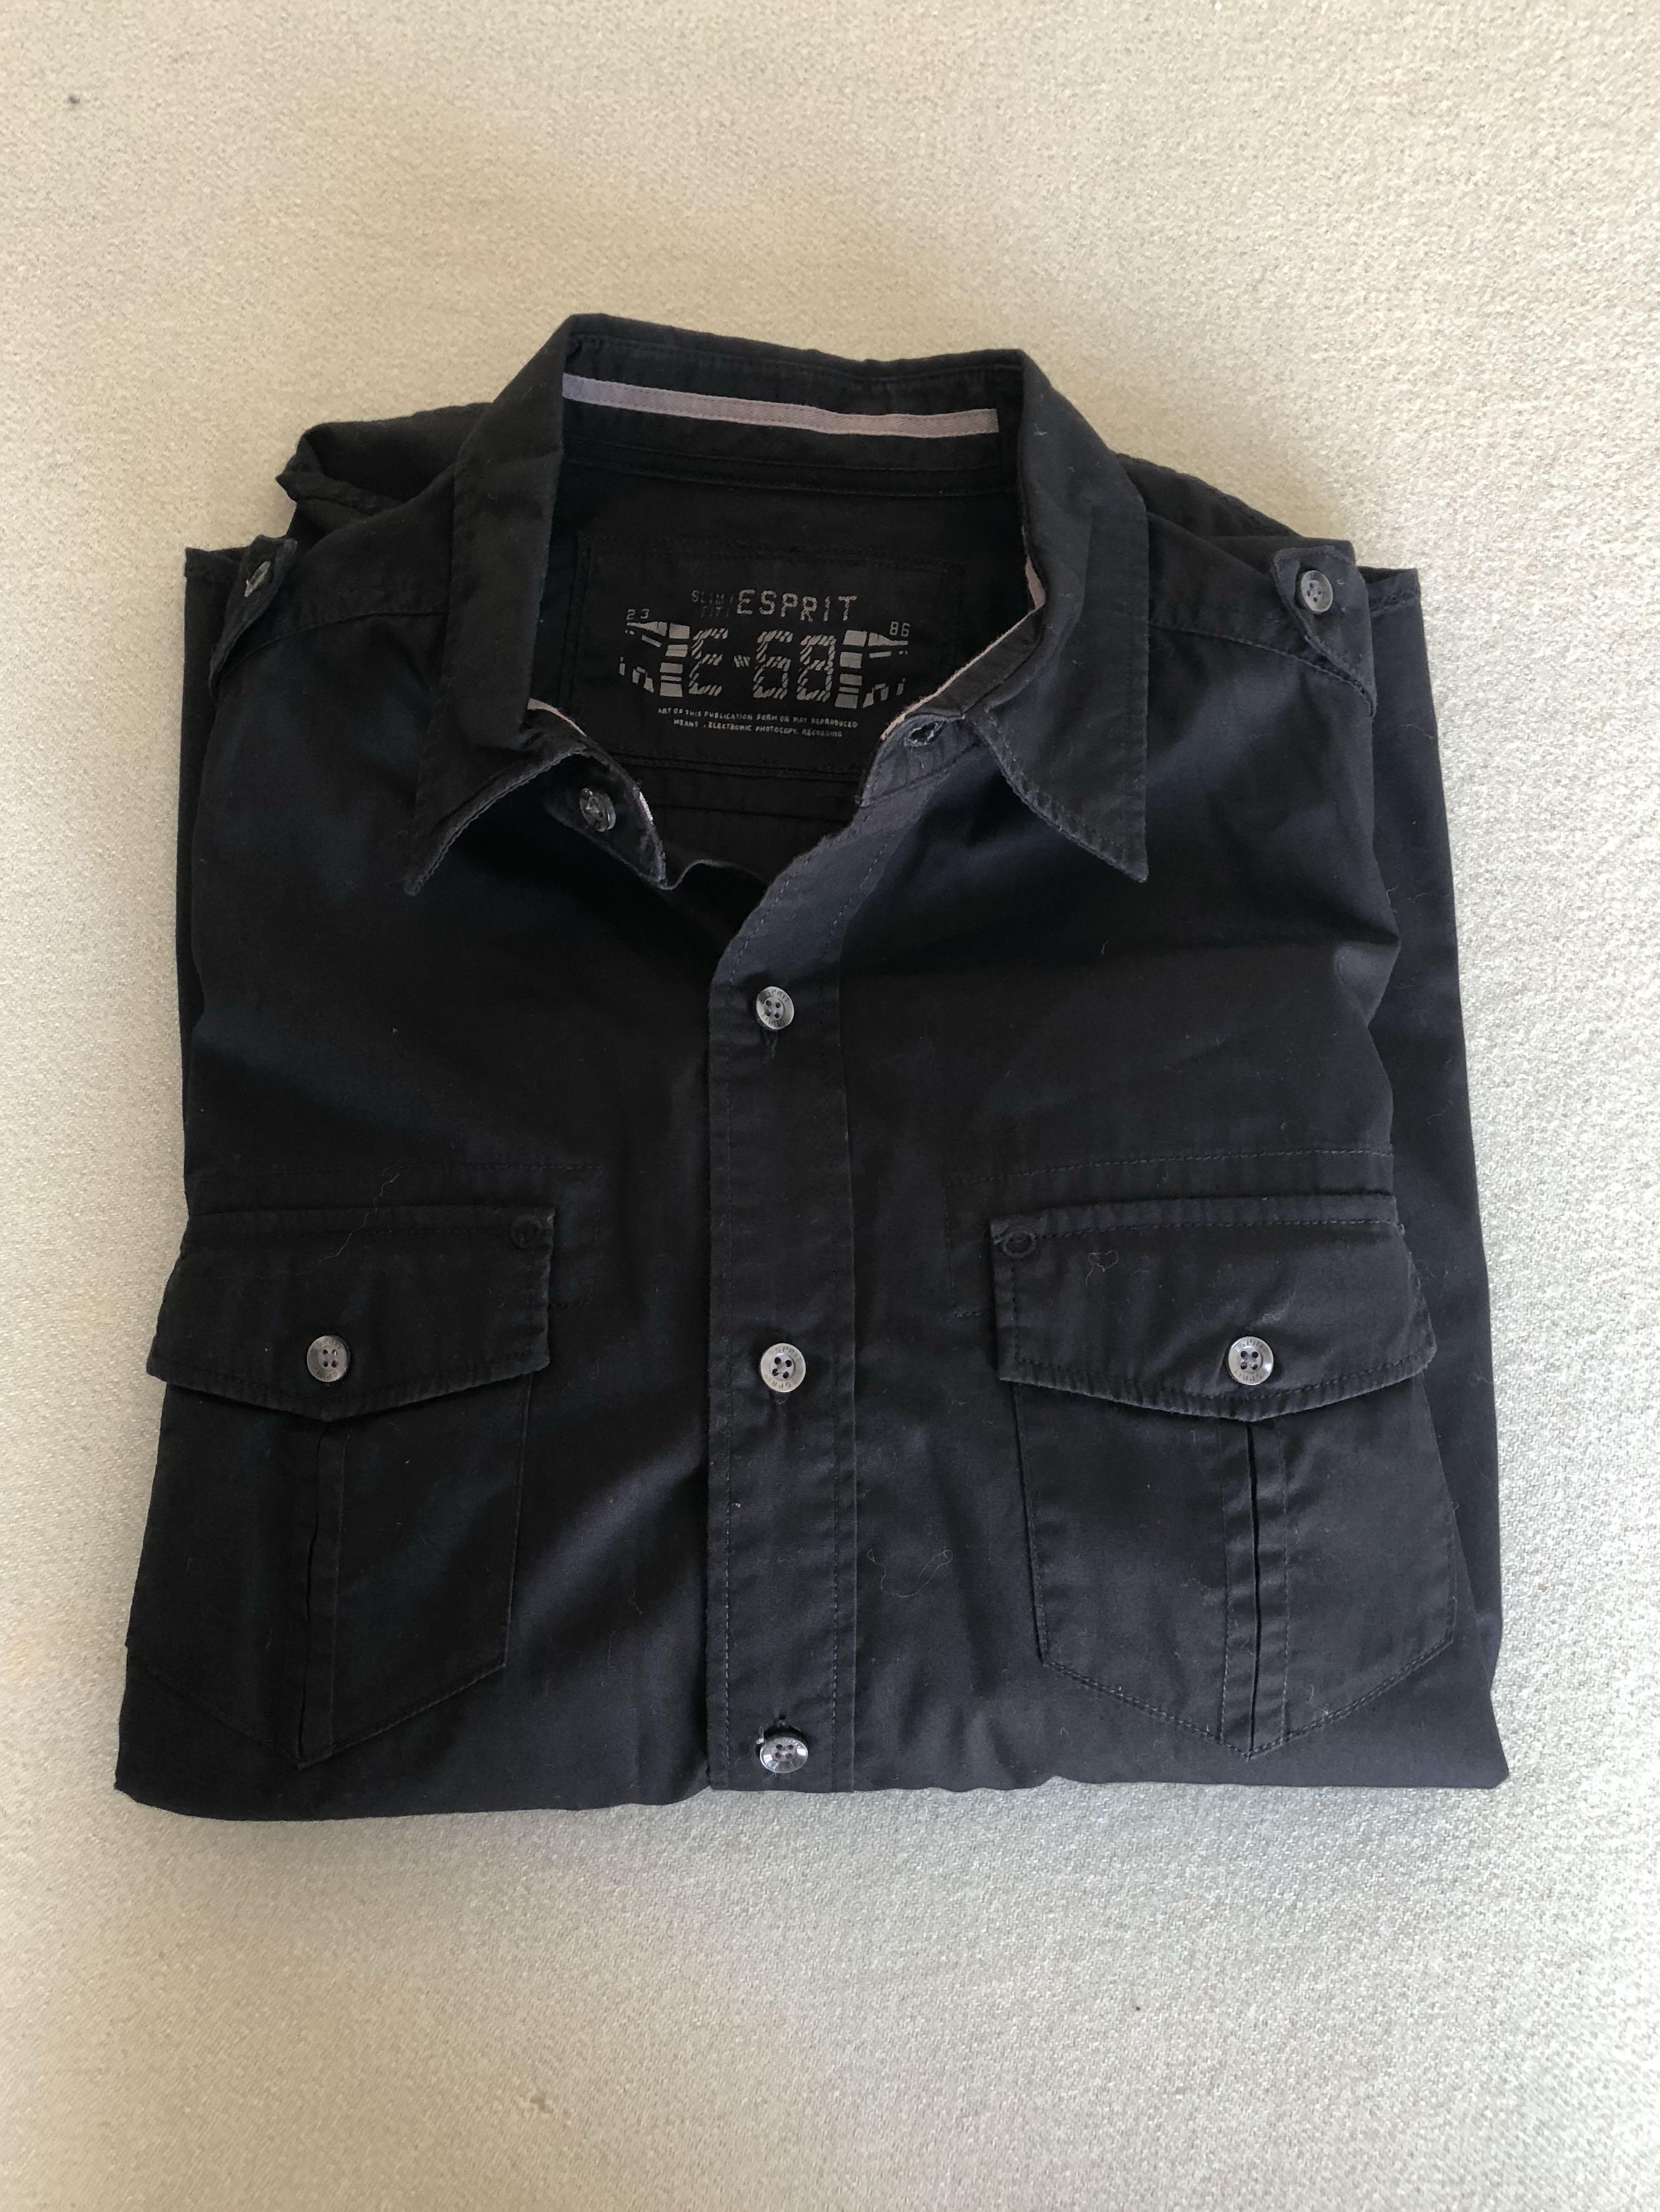 Esprit Button Up